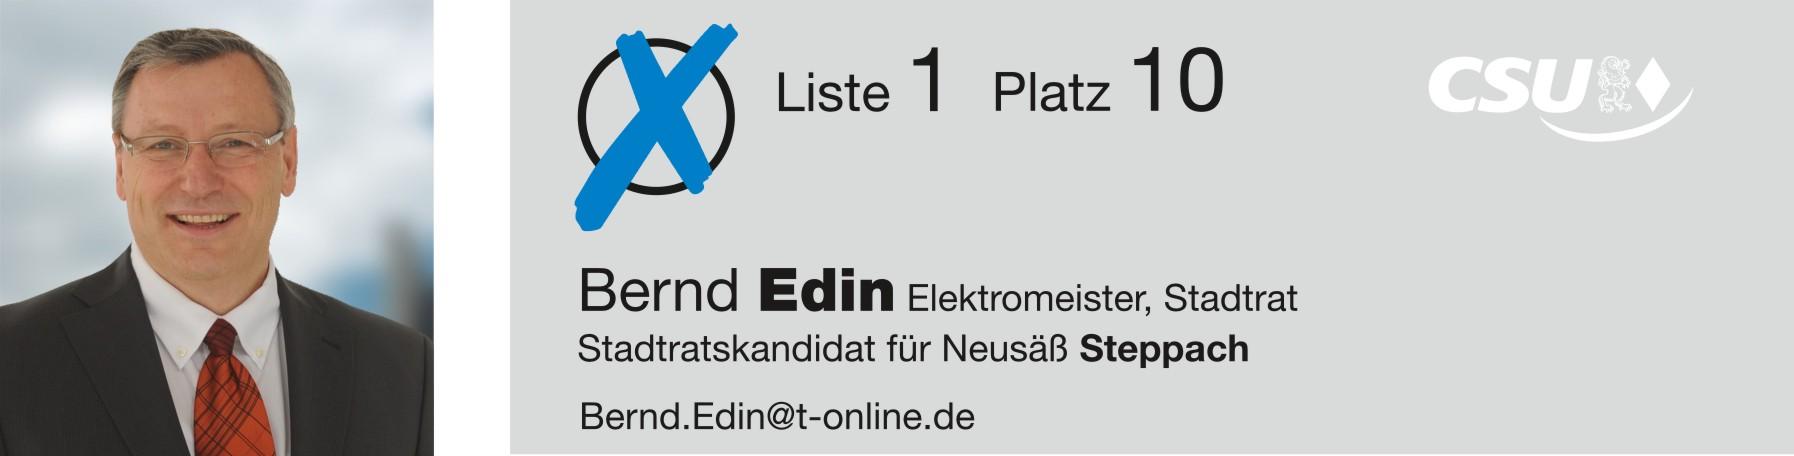 Bernd Edin